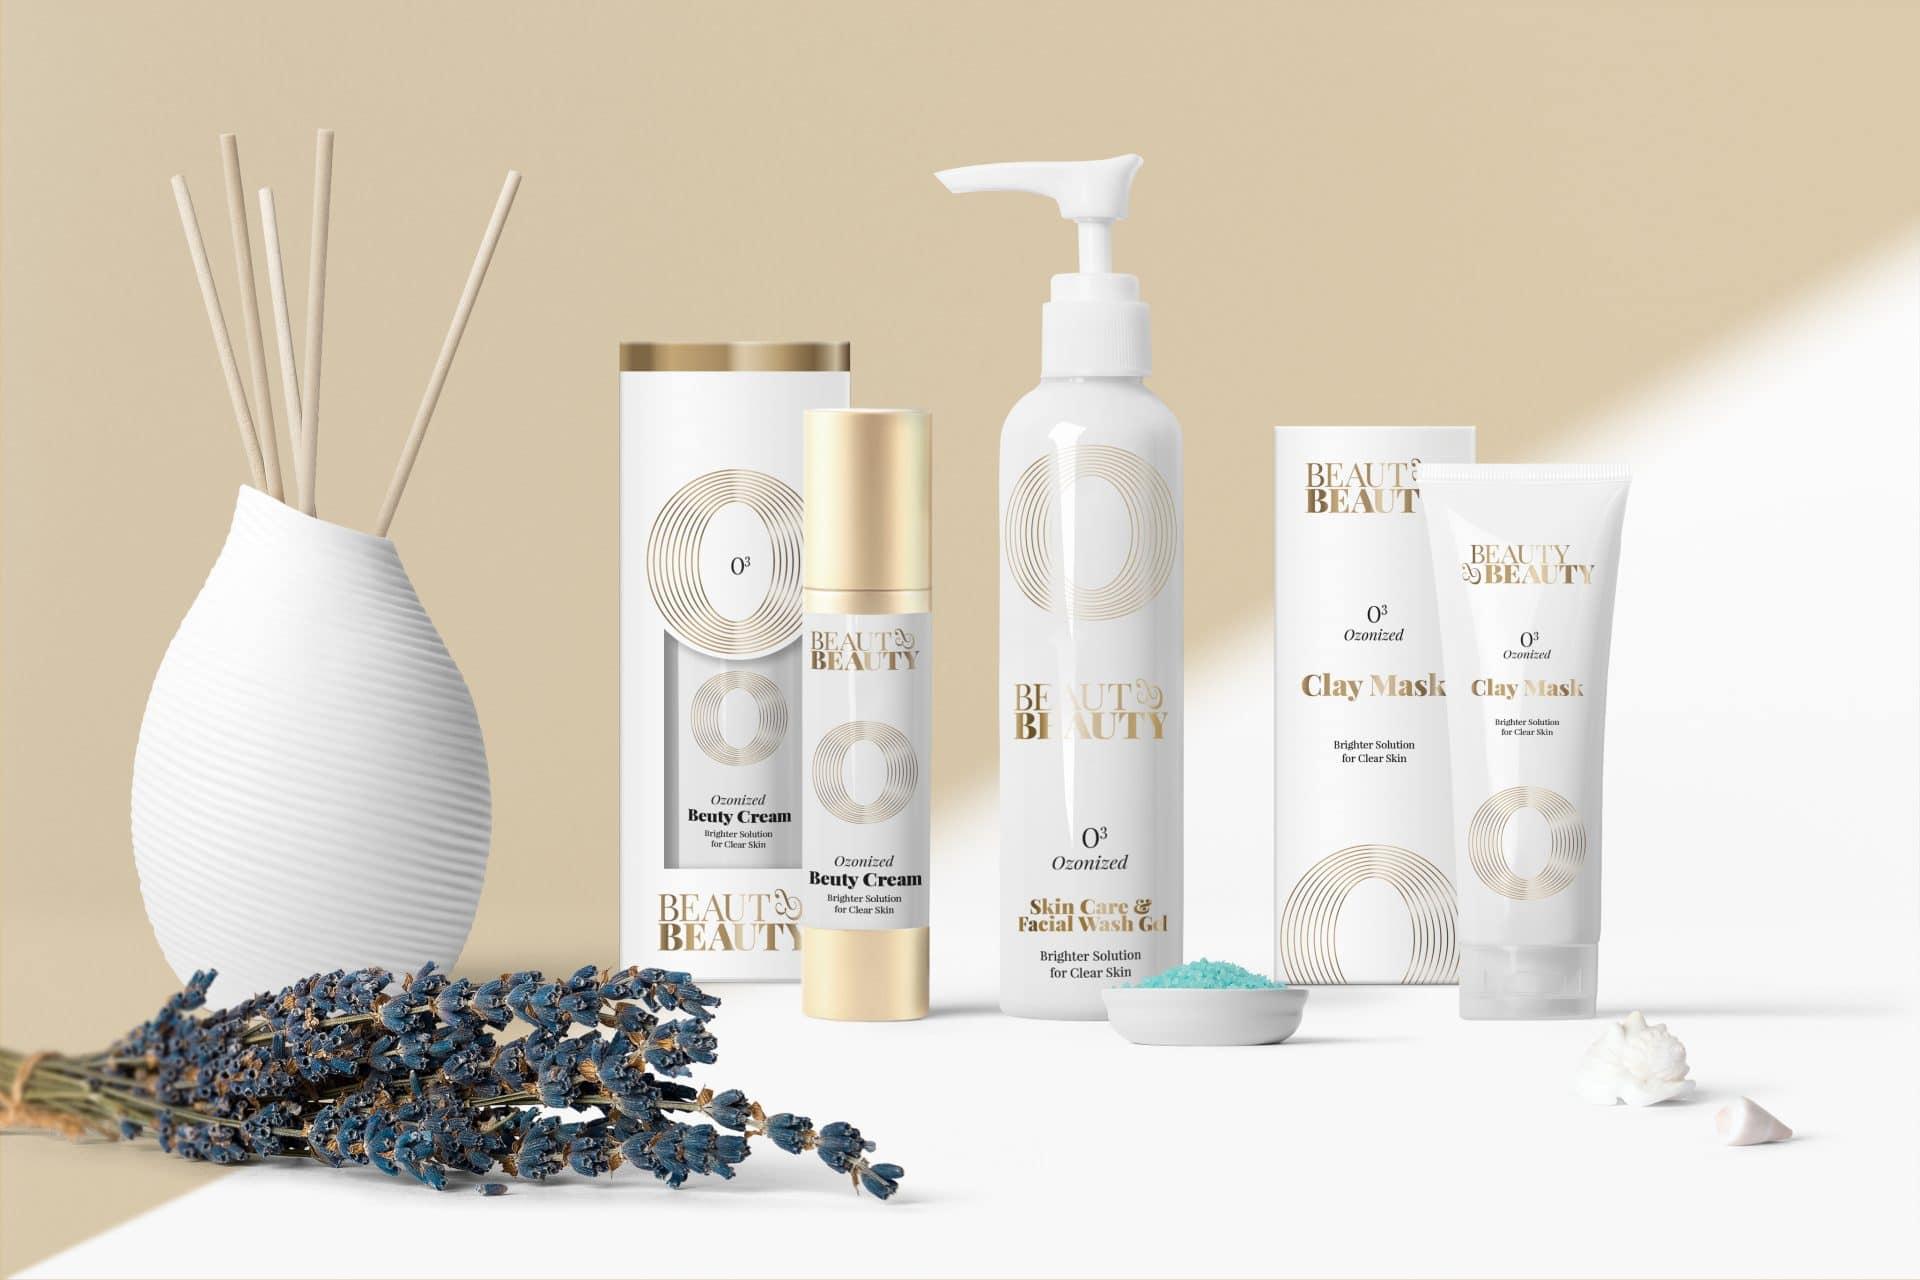 Recto Adworks BEAUT&BEAUTY Ambalaj Tasarımı